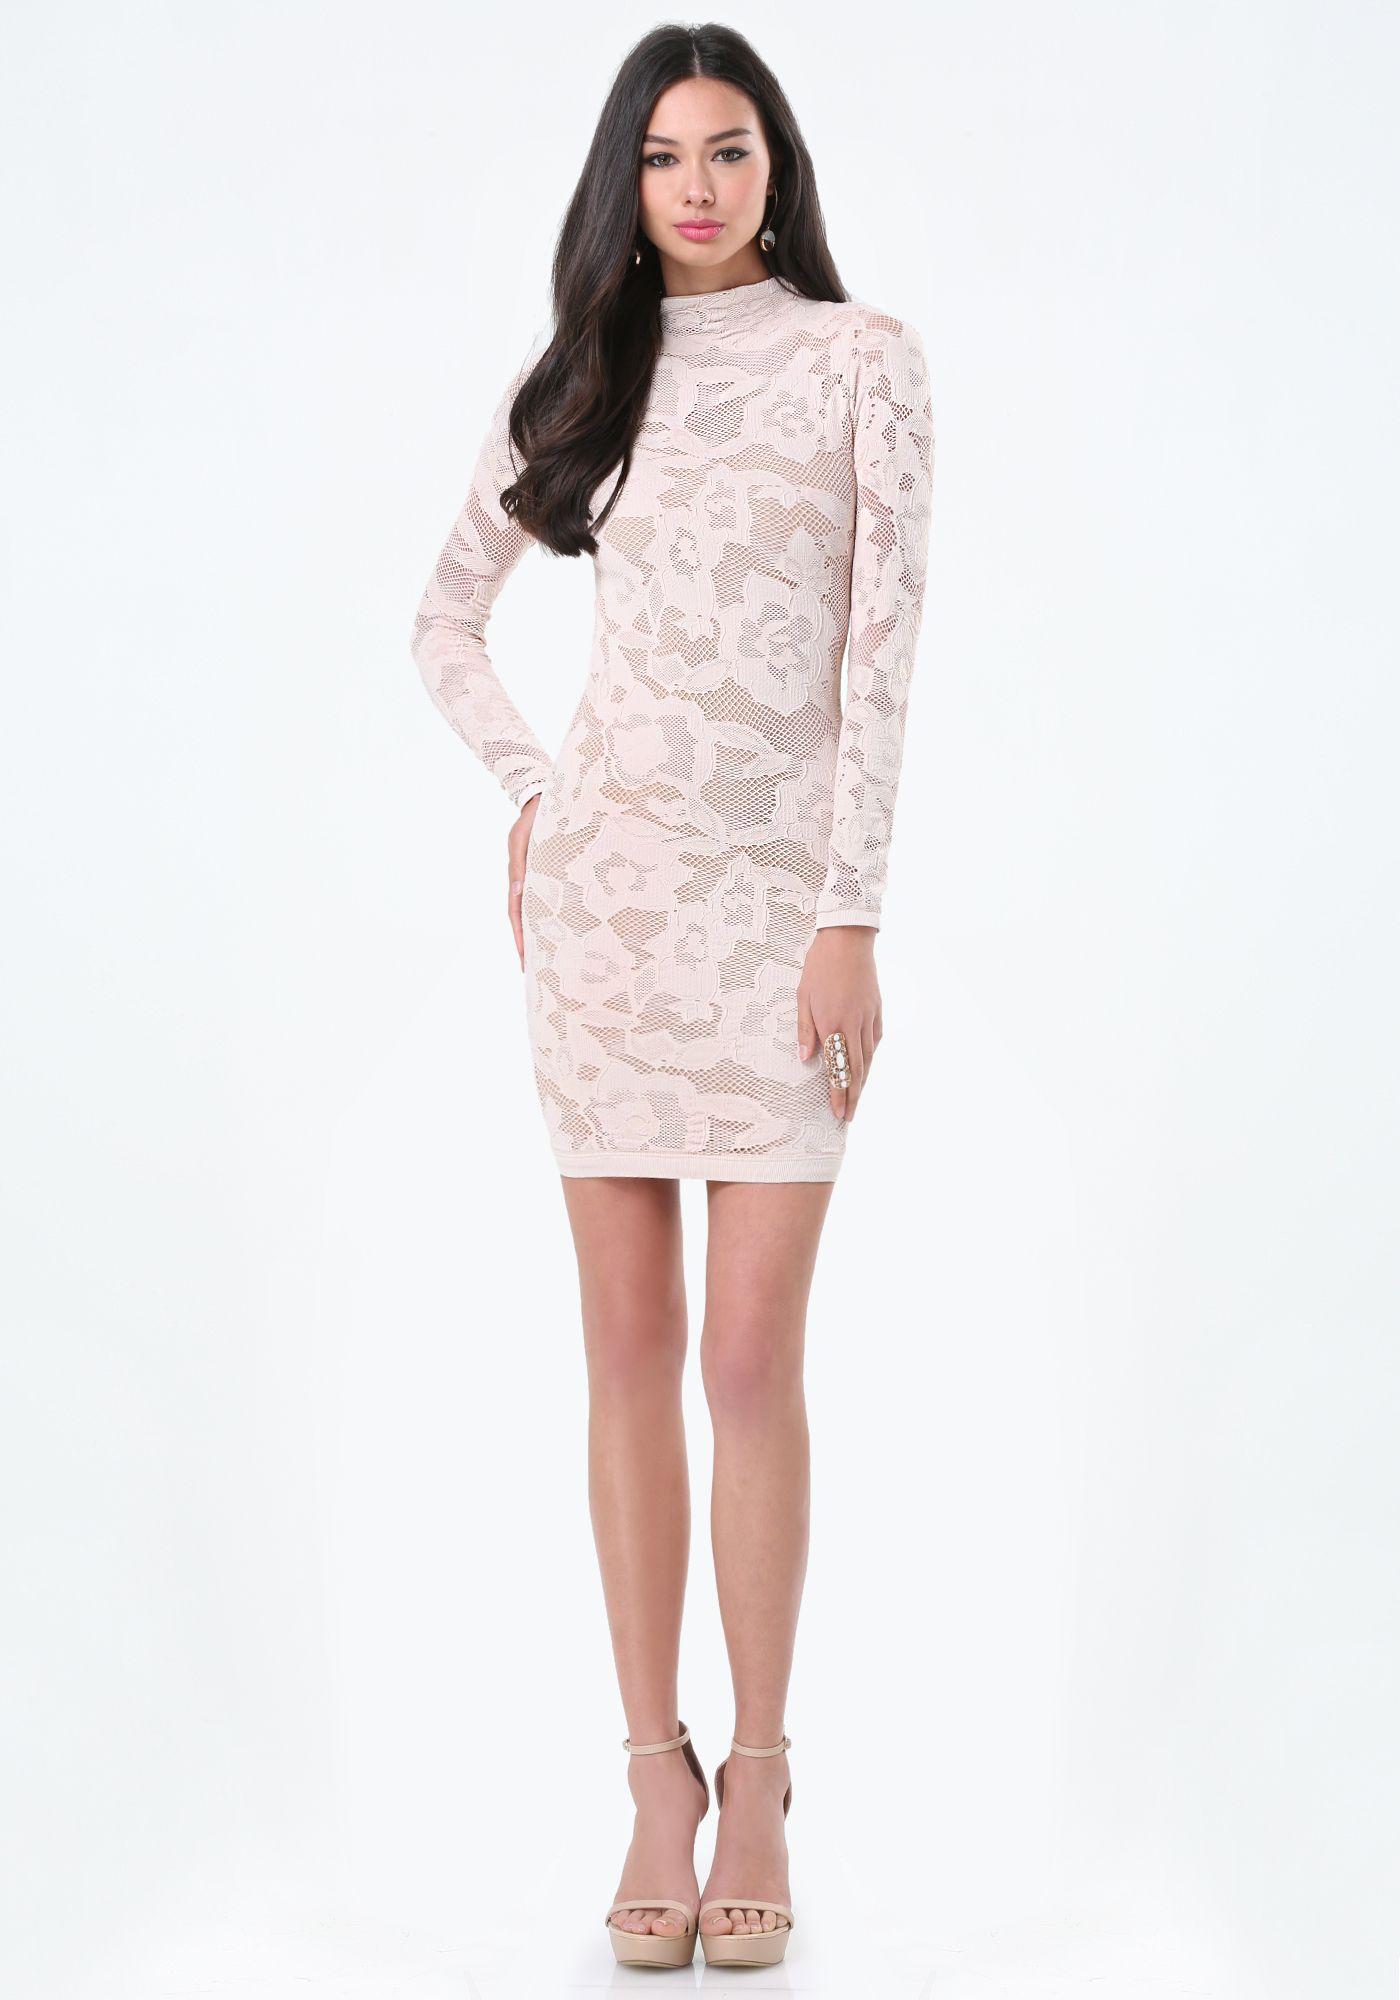 d291503db Bebe ---- Allover Lay Dress ---- Bridget Hollitt ---- 257921-ycy ----